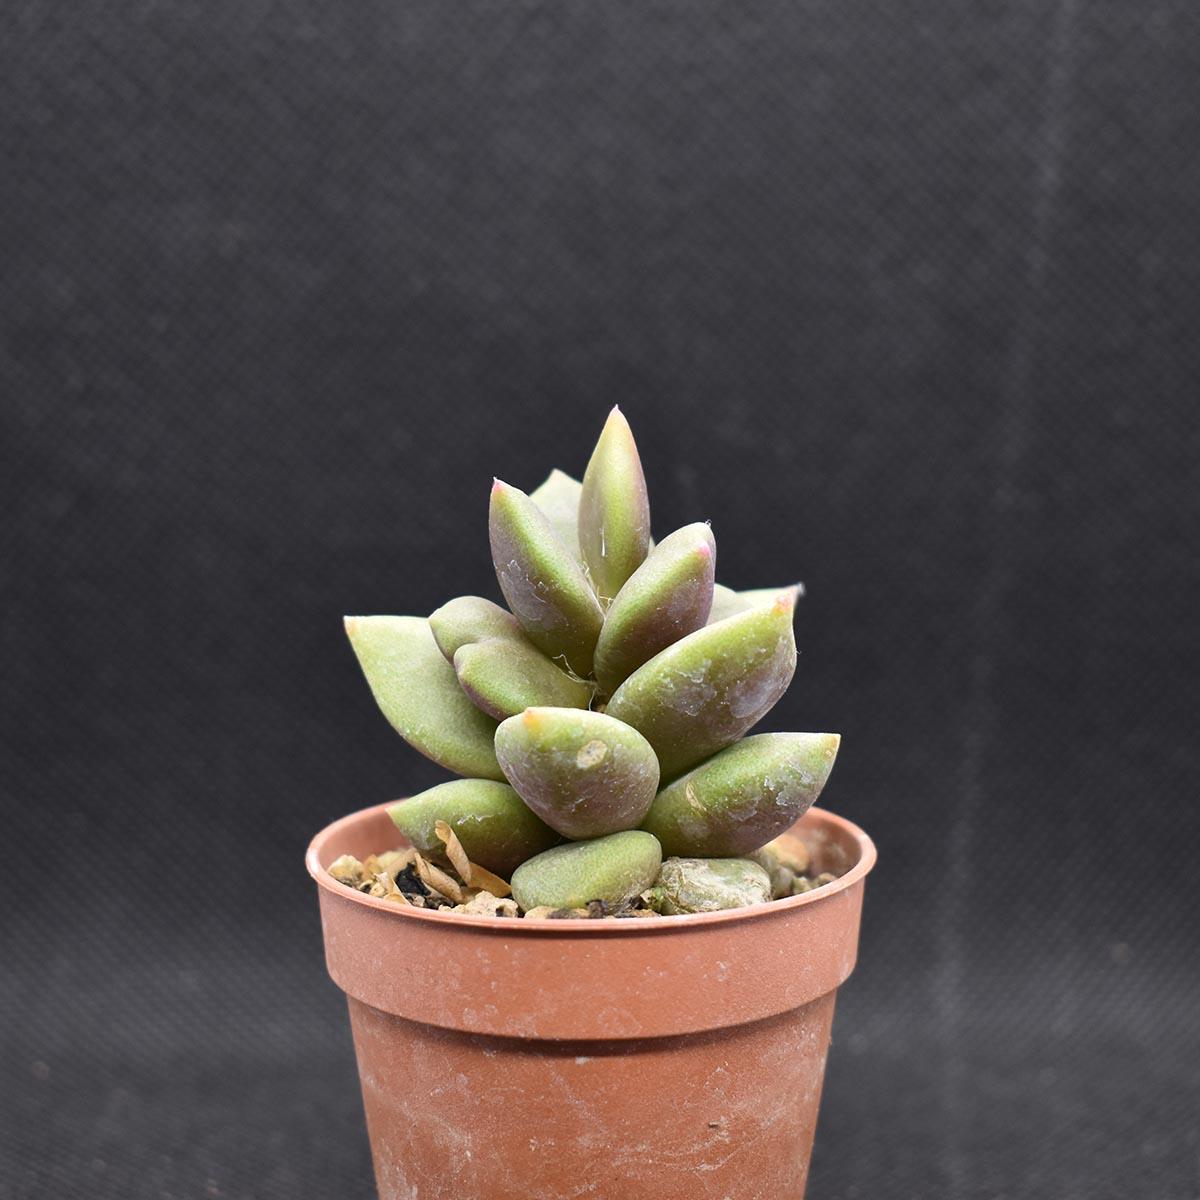 eden plantae succulente anacampseros rufescens 1